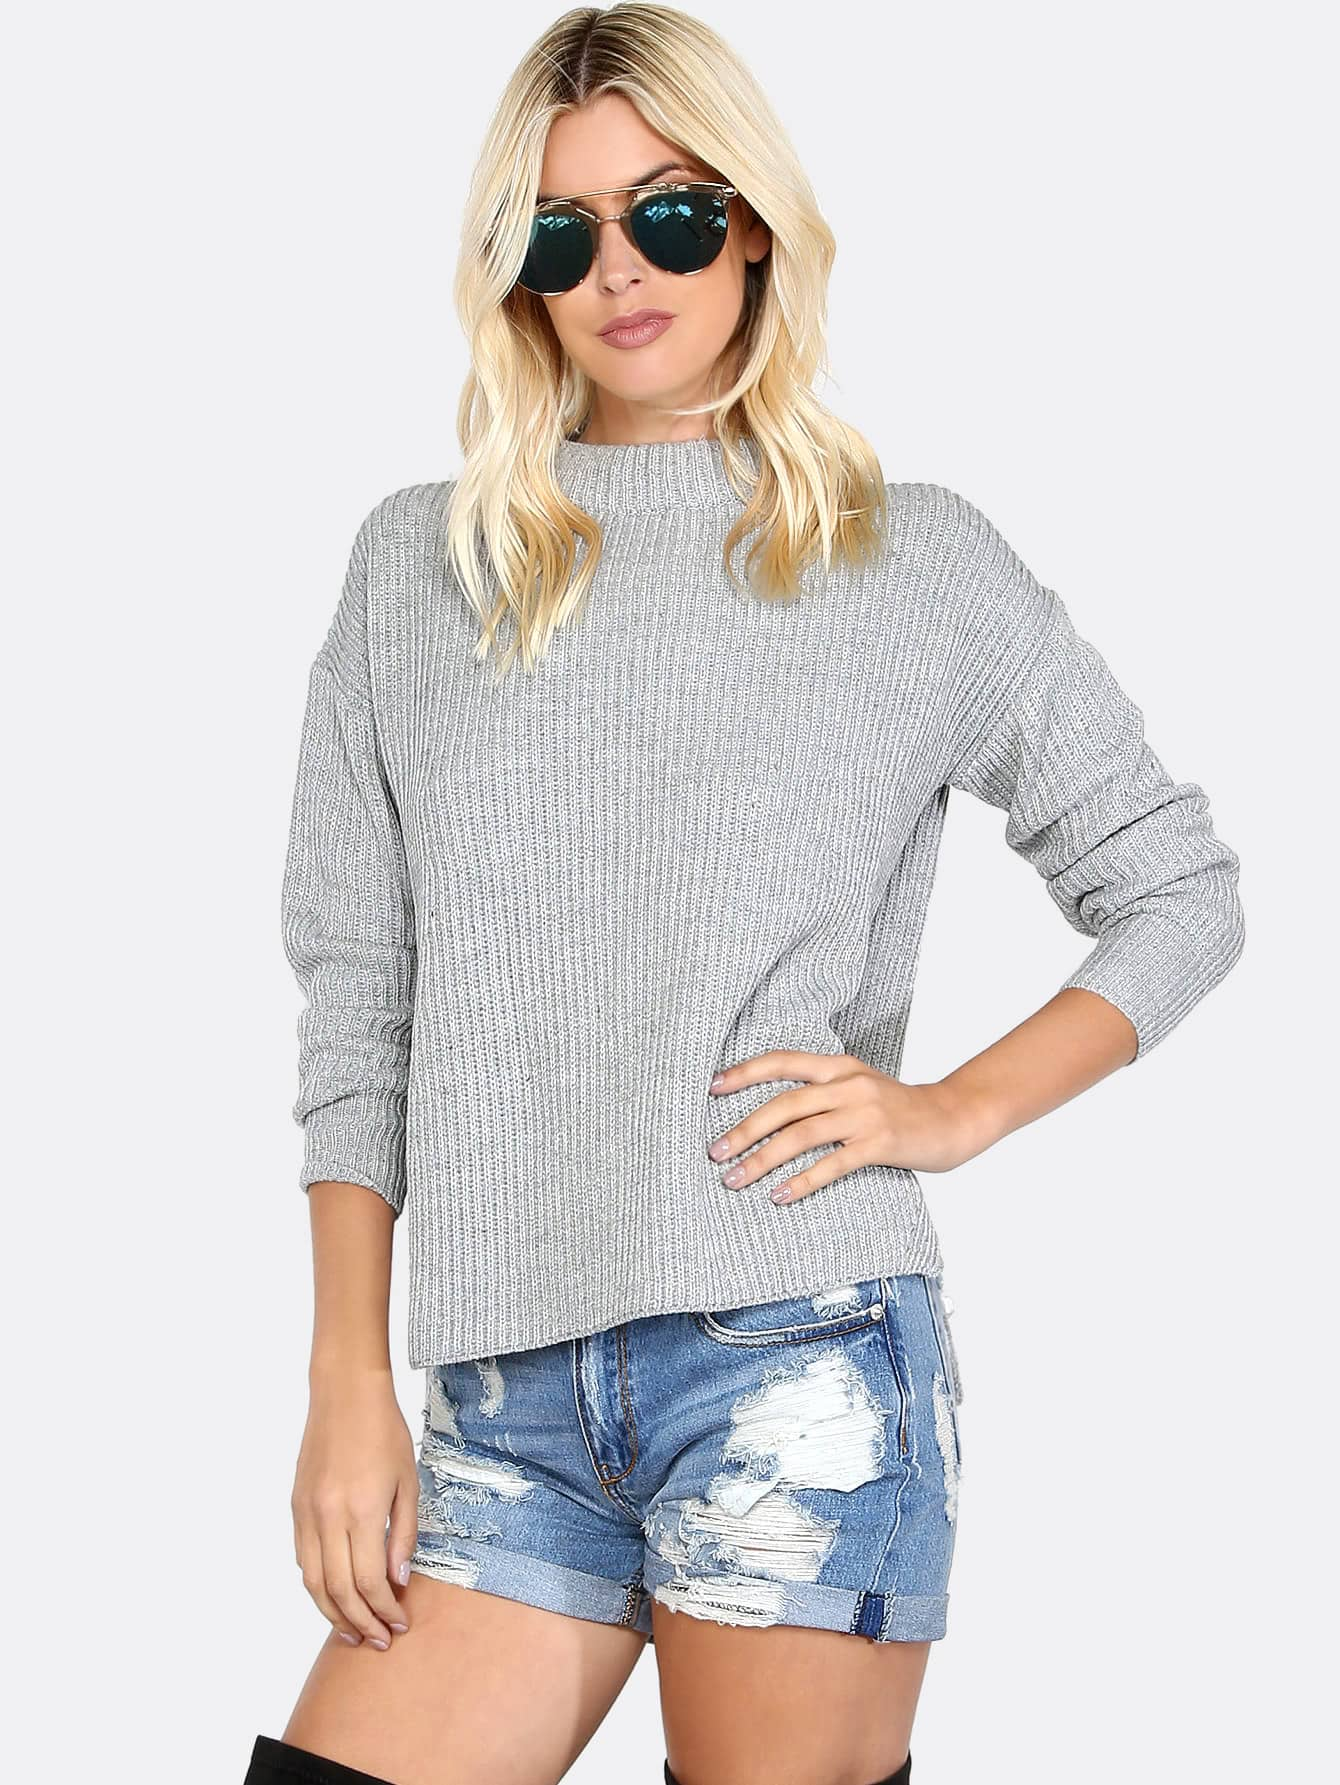 sweater160809711_2